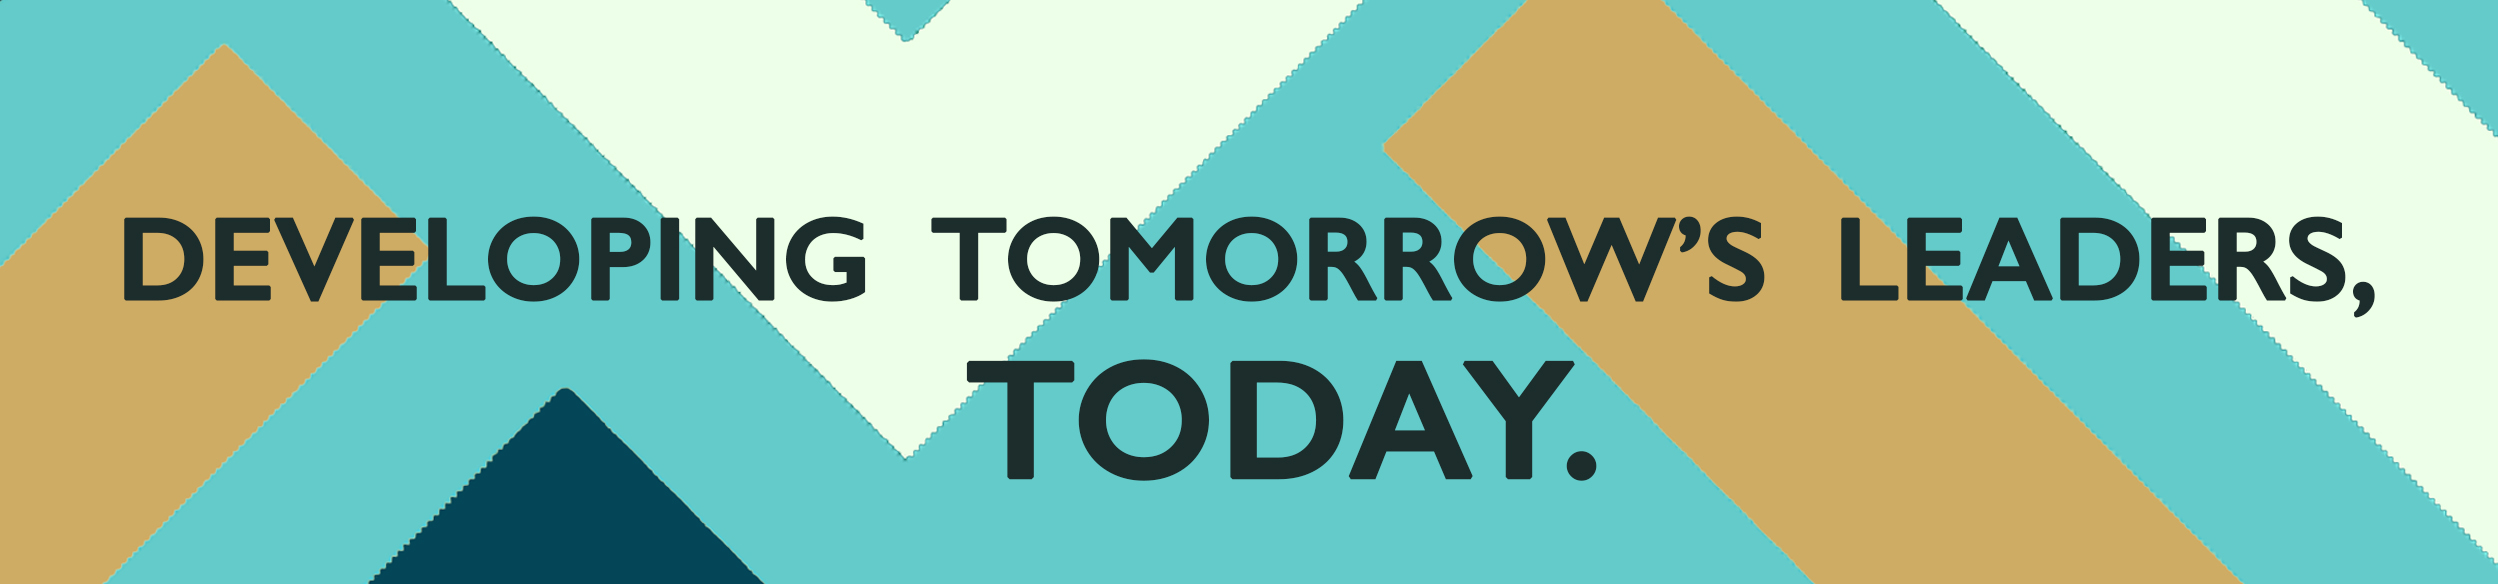 developing tomorrow's leaders today.jpg